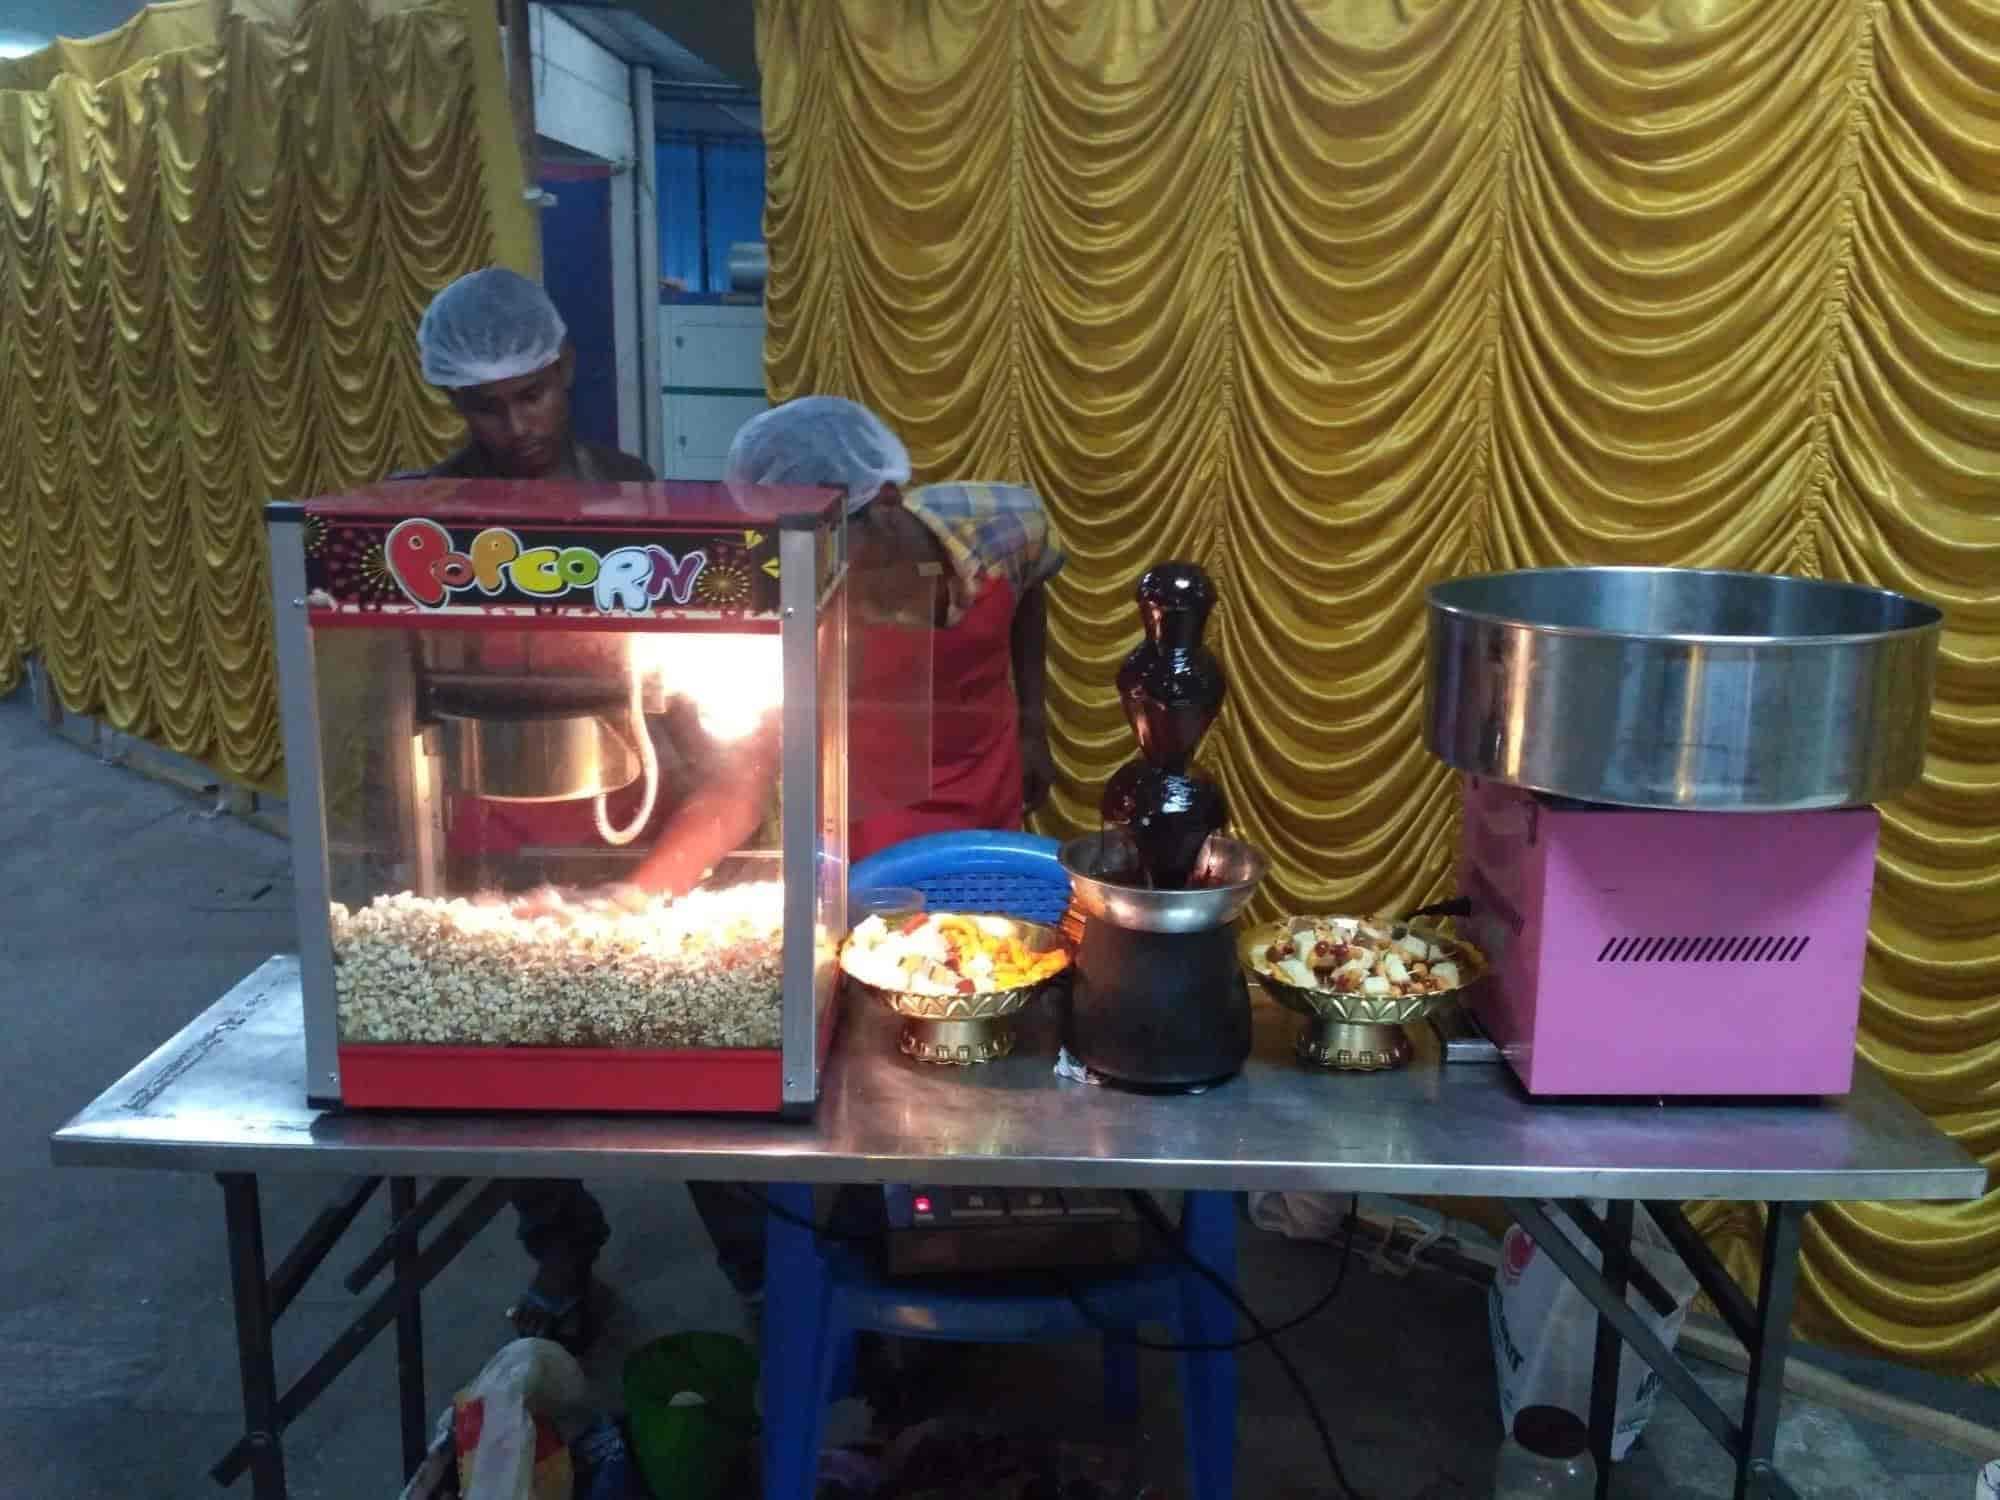 Popcorn Making Machine Afrose A To Z Wedding Events Photos Ayanavaram Chennai